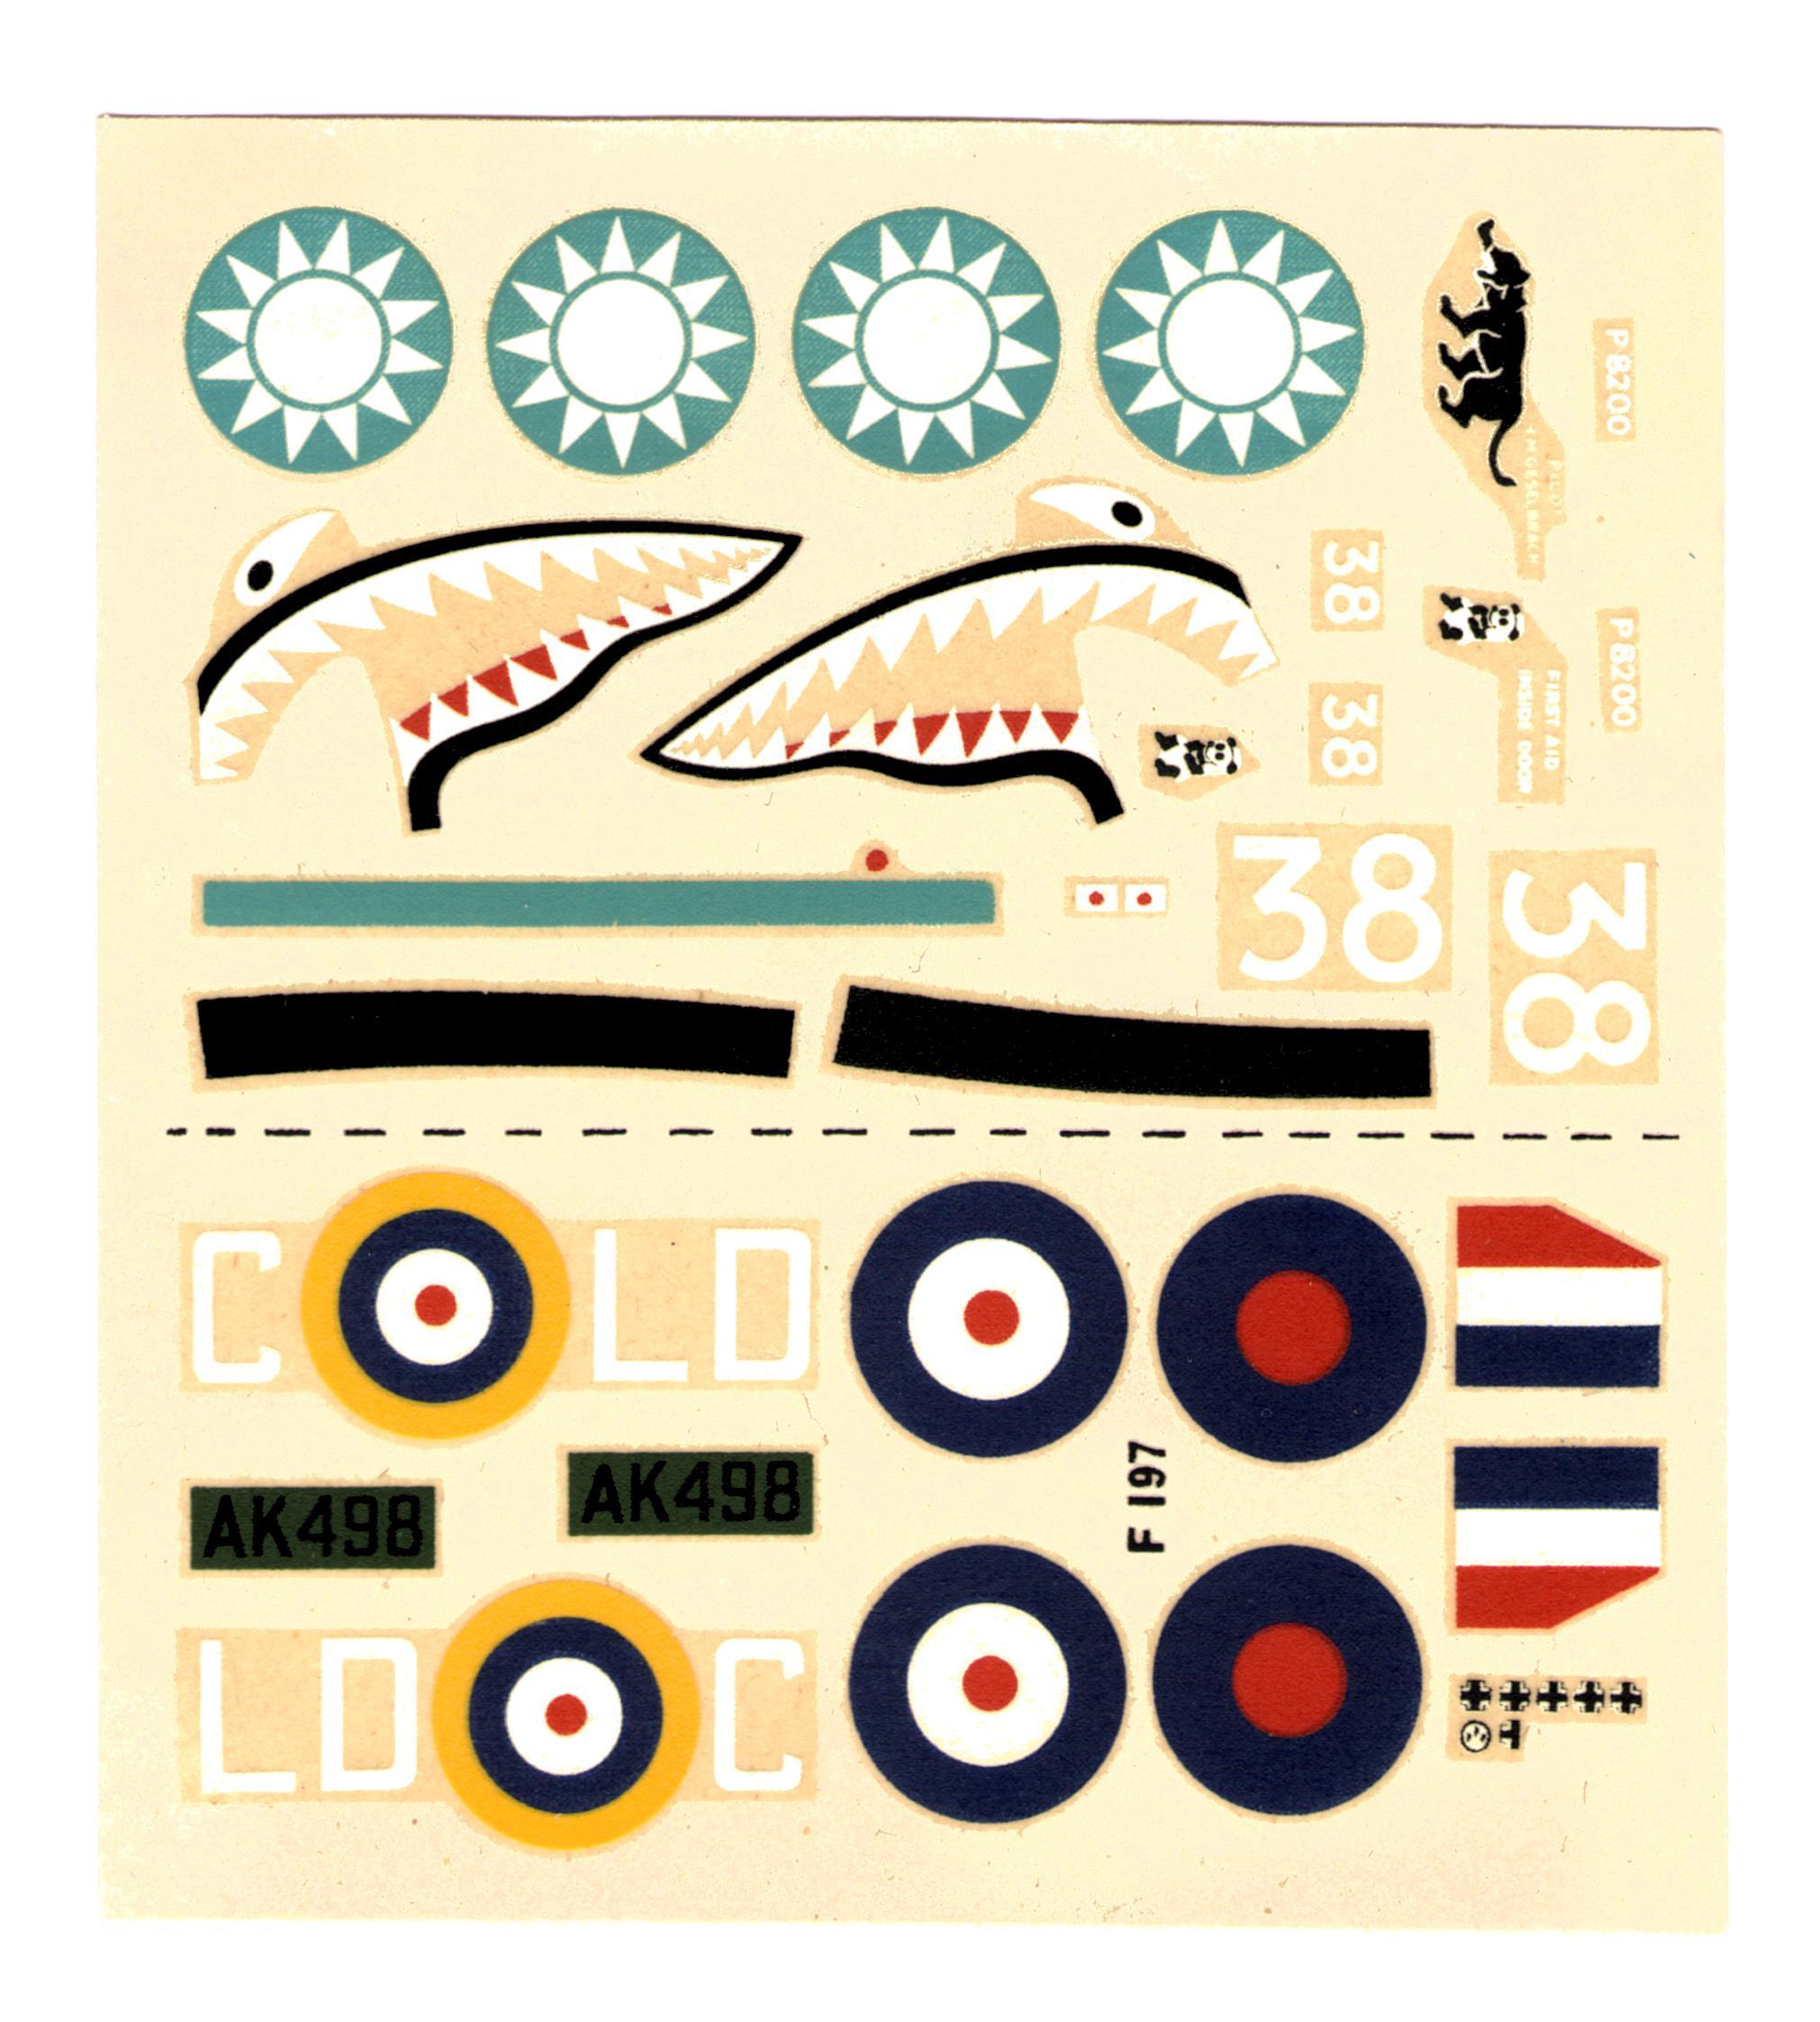 Декаль NOVO Toys Ltd F197 Curtiss P-40 Tomahawk 1/72